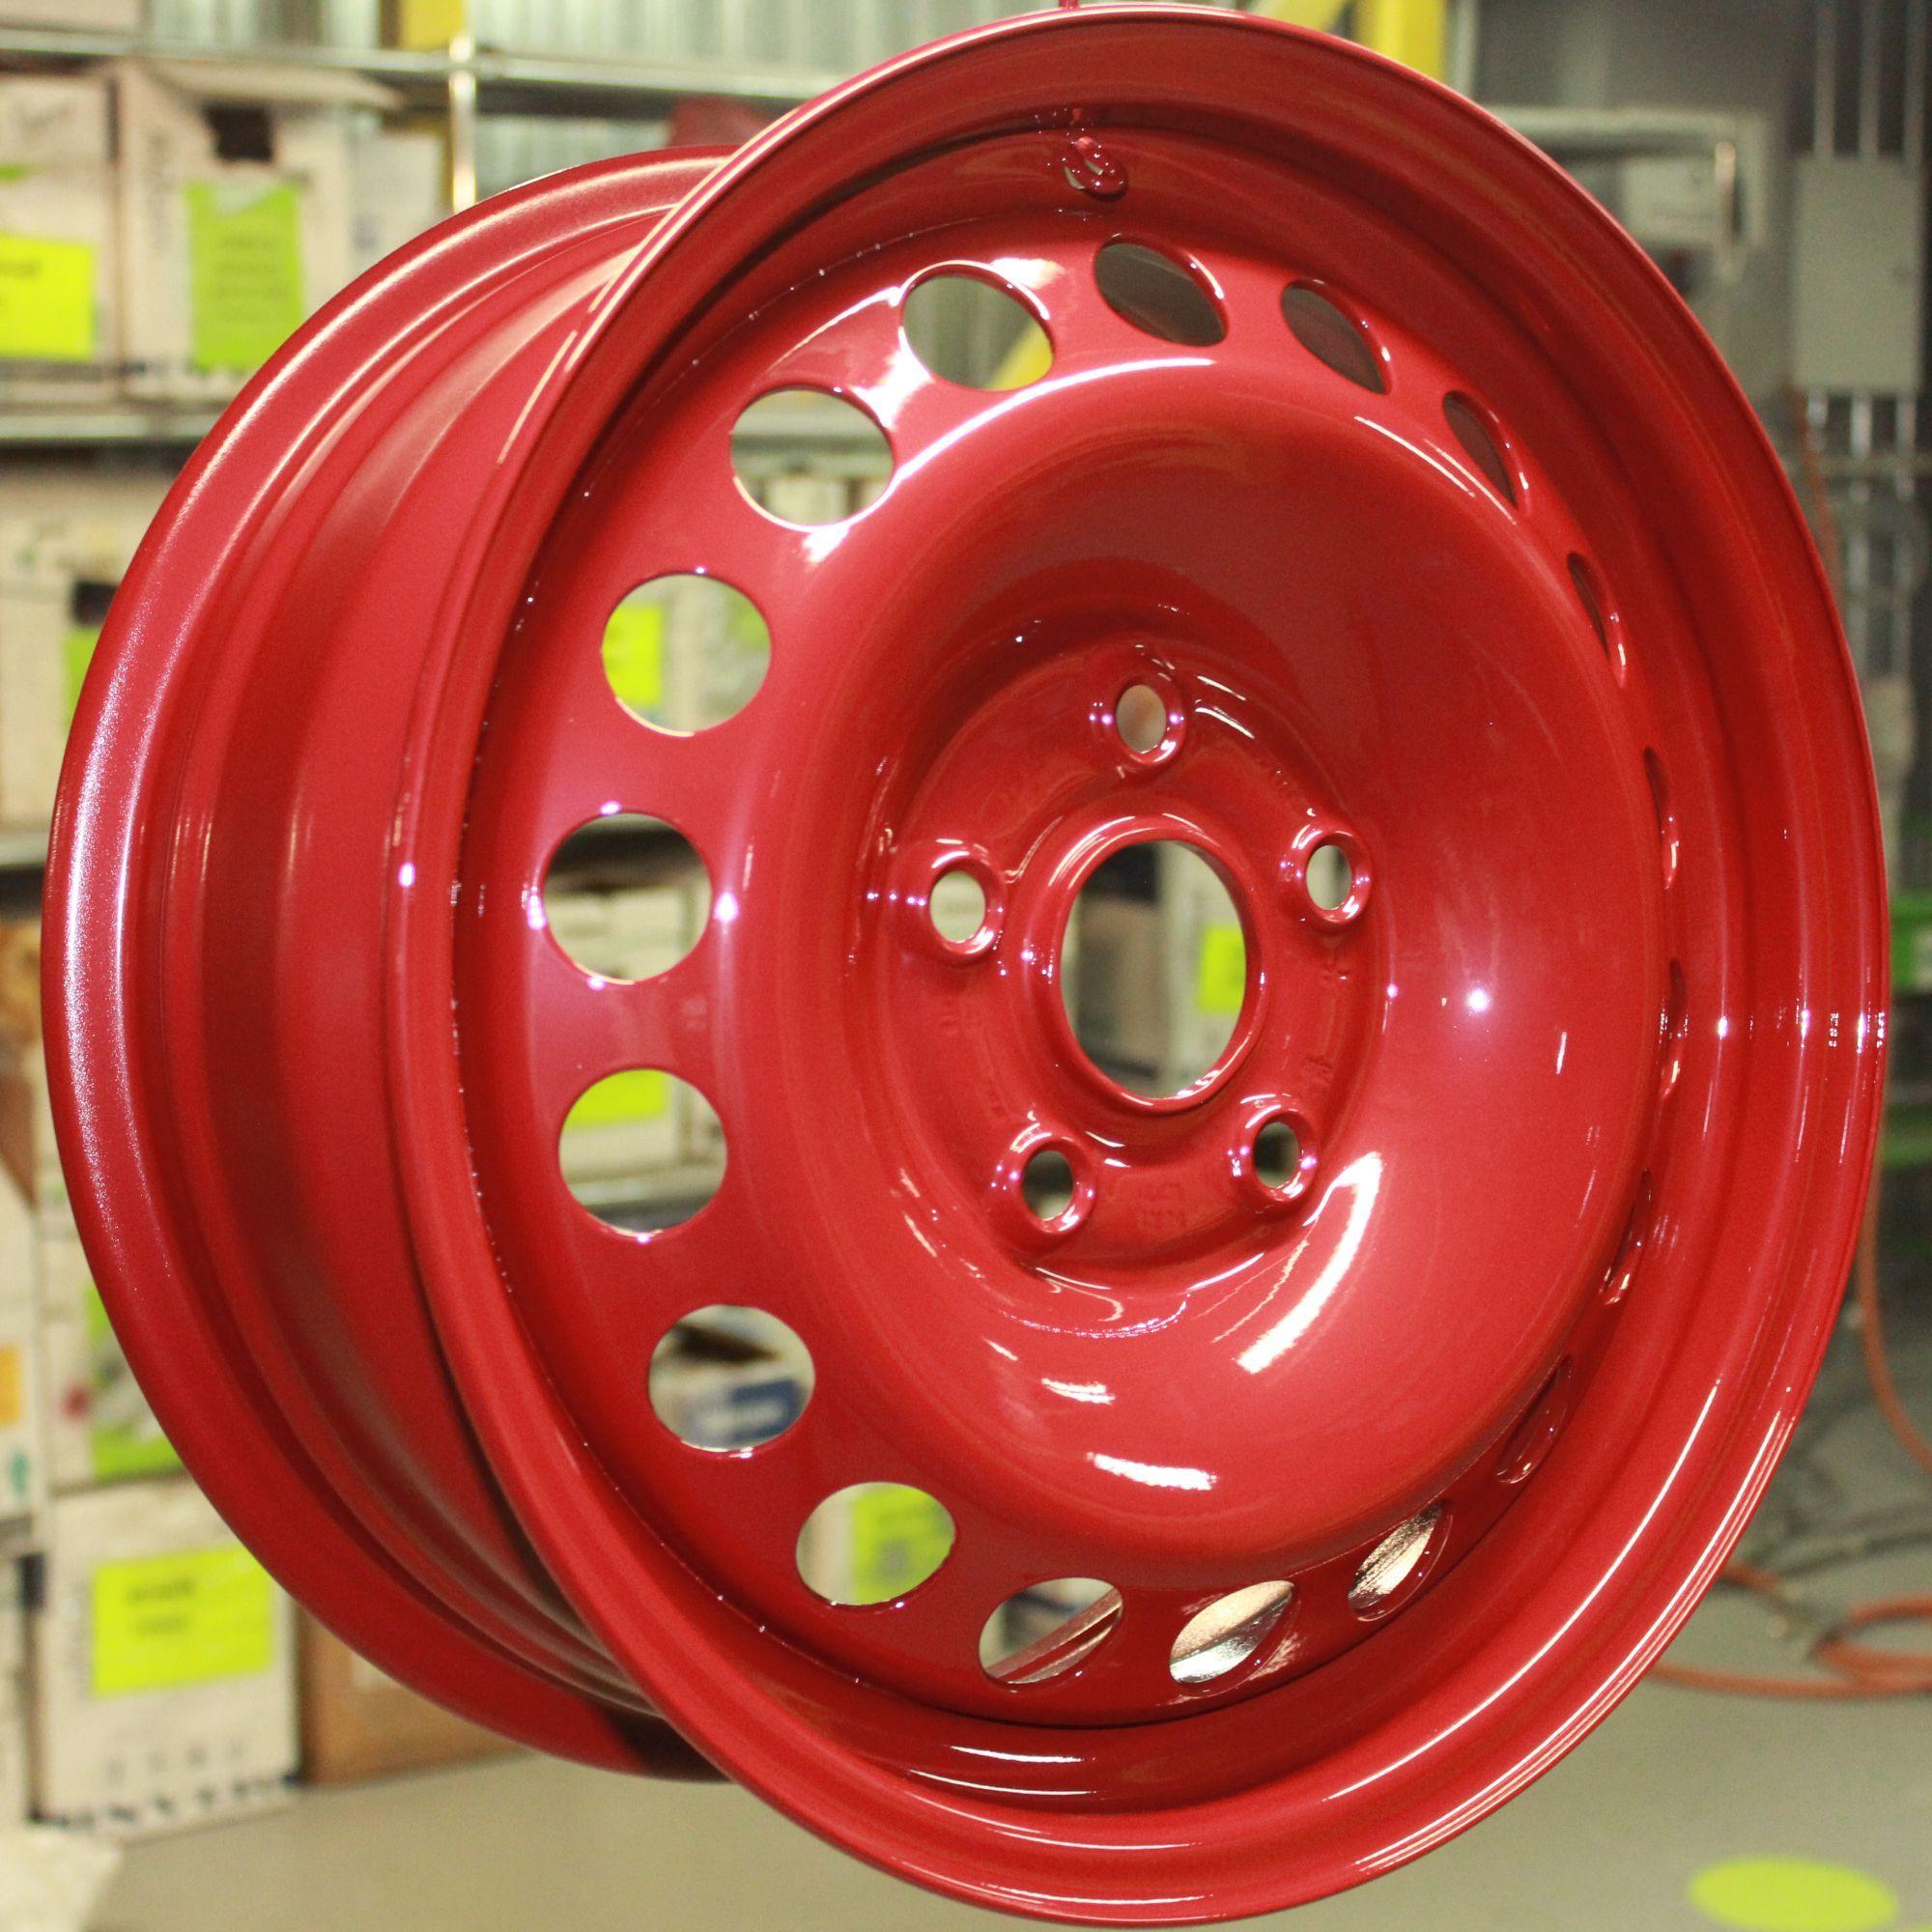 Steel Wheel Coating Steelwheelcoating Steelwheelpainting Steelwheelpowdercoating Paintingsteelwheels Steelwheelandrimr Ruedas De Acero Rines Rines Bbs